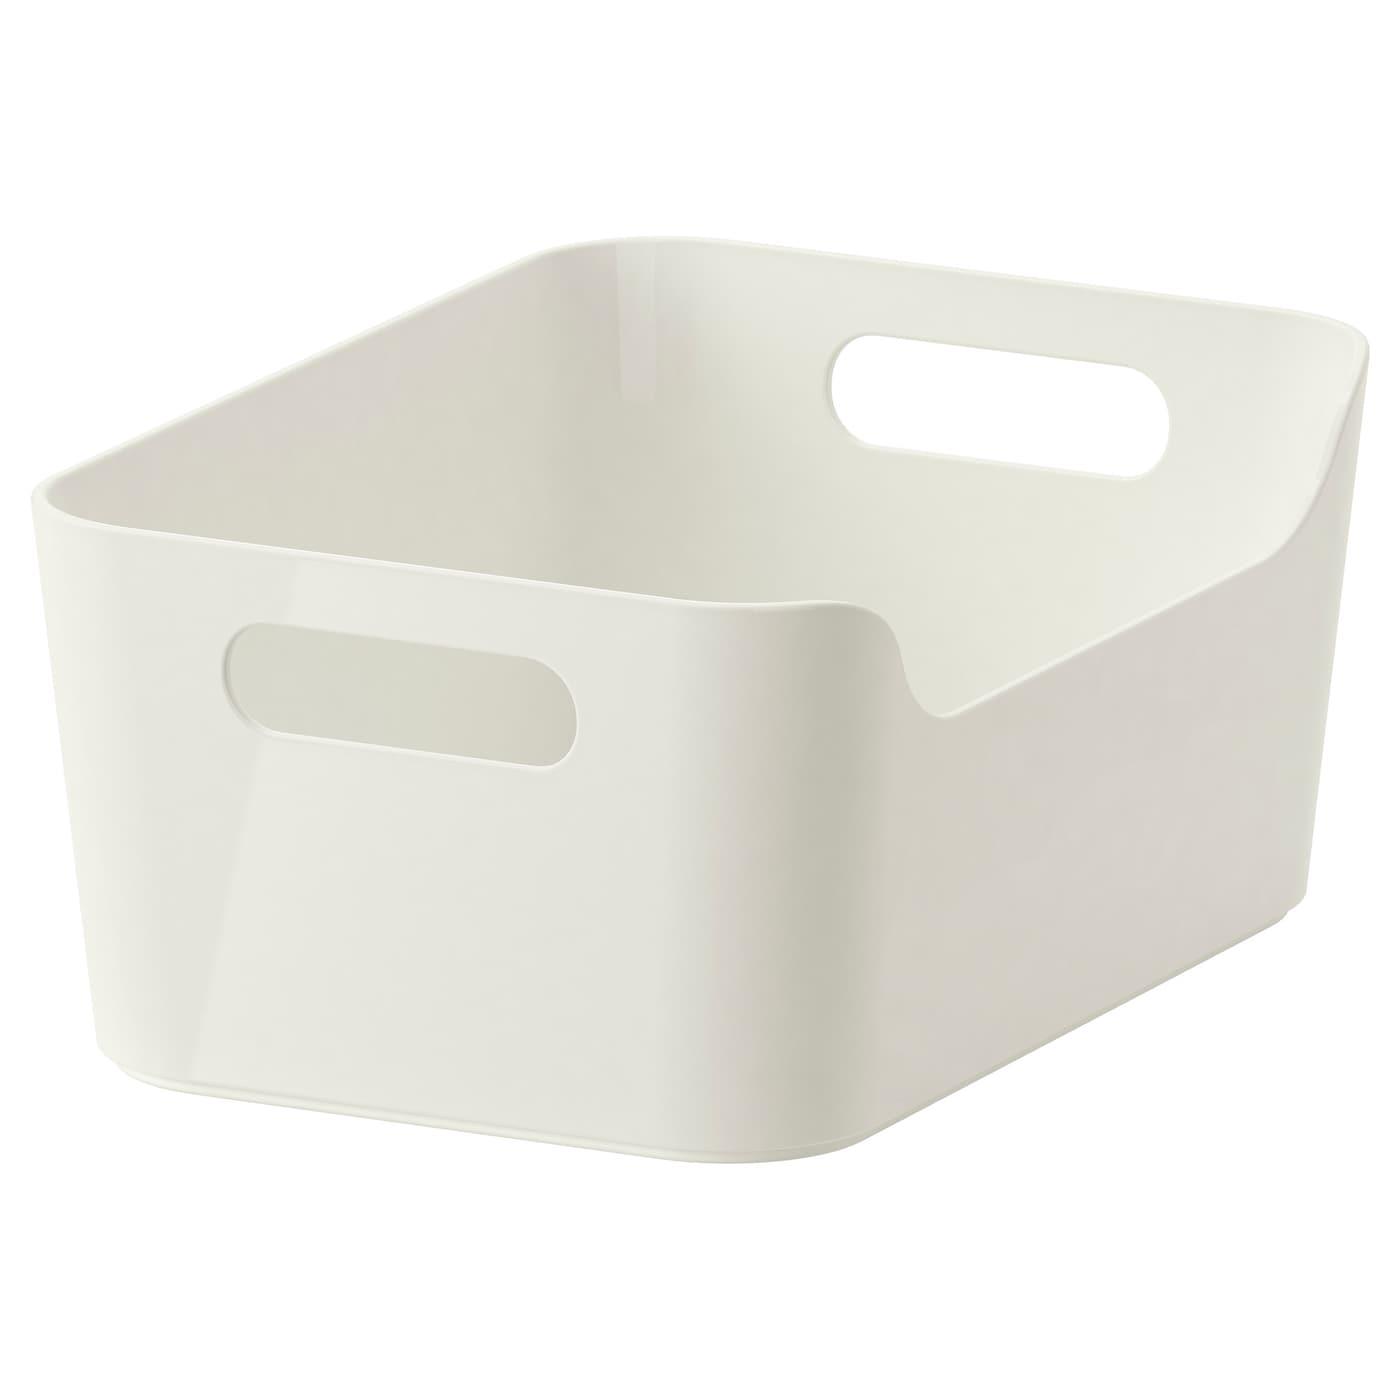 VARIERA Box - Hochglanz weiß 16x16 cm